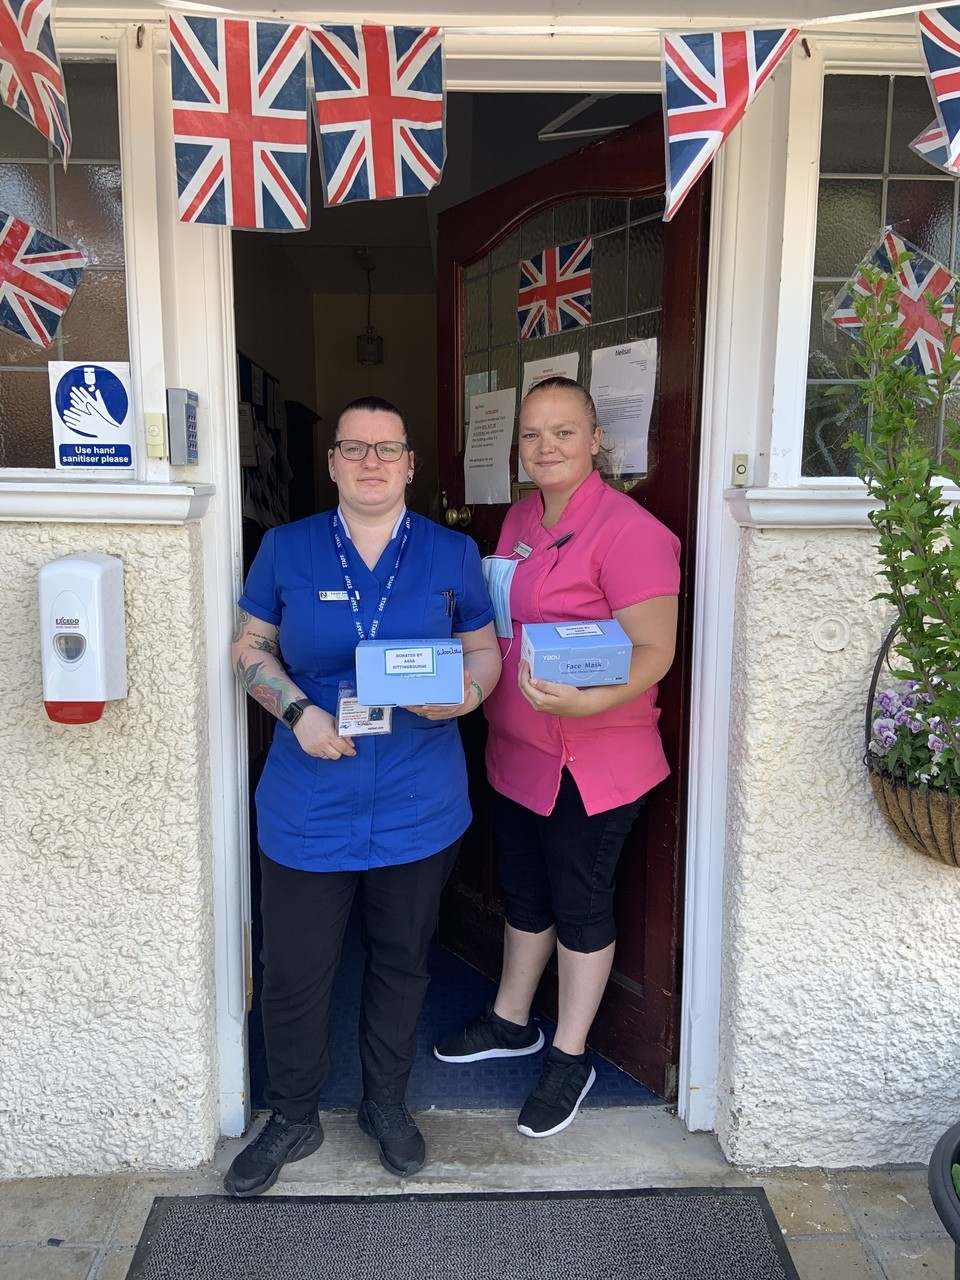 Asda Sittingbourne Donates 650 masks to local care homes | Asda Sittingbourne